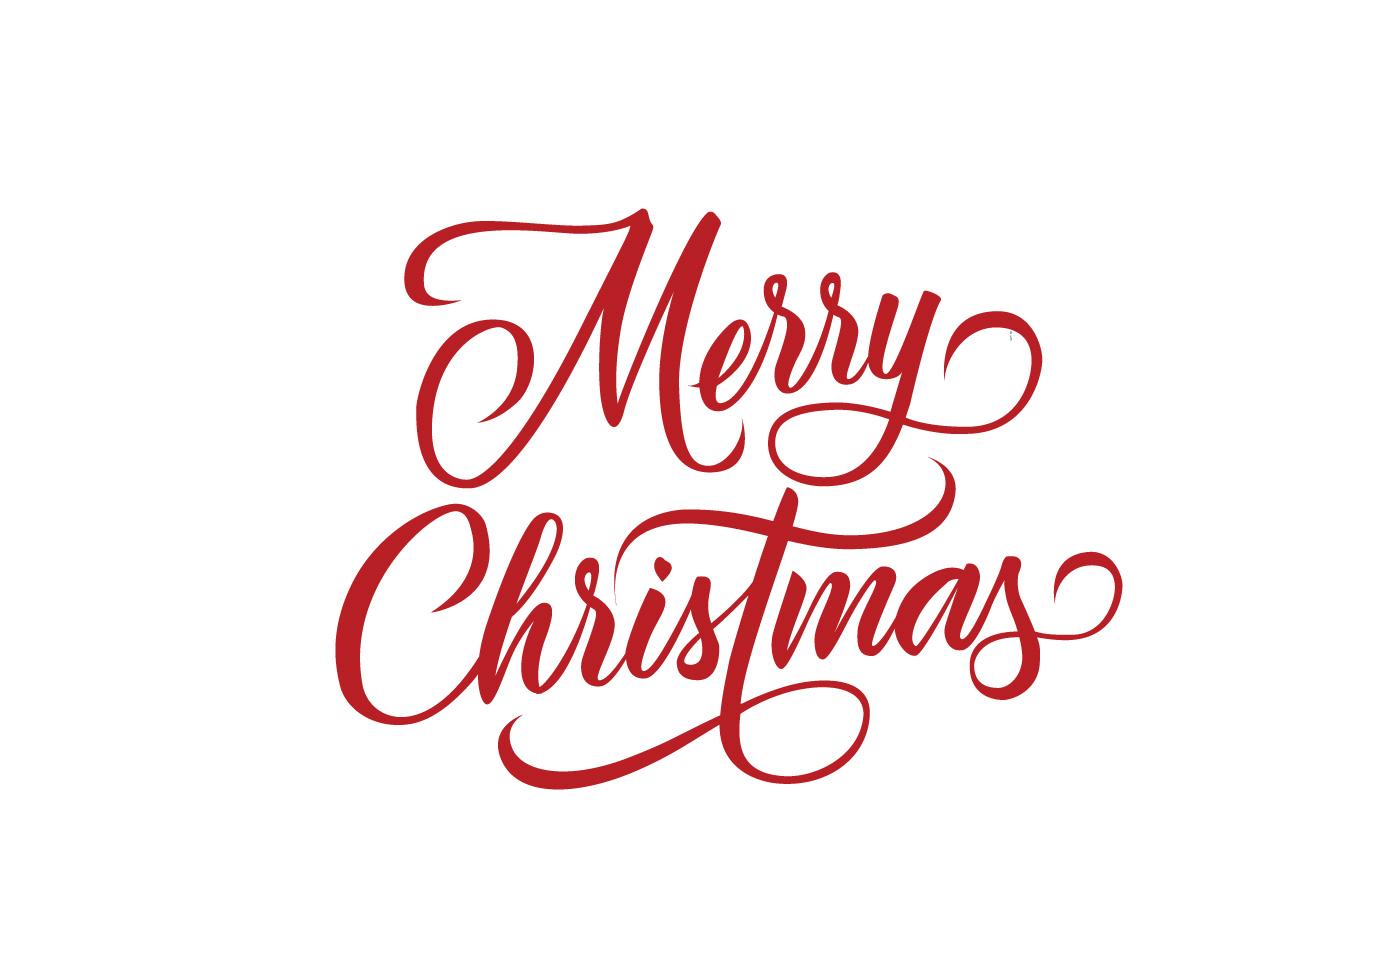 Merry Christmas Decorative Lettering Vector Download Free Vectors Clipart Graphics Vector Art